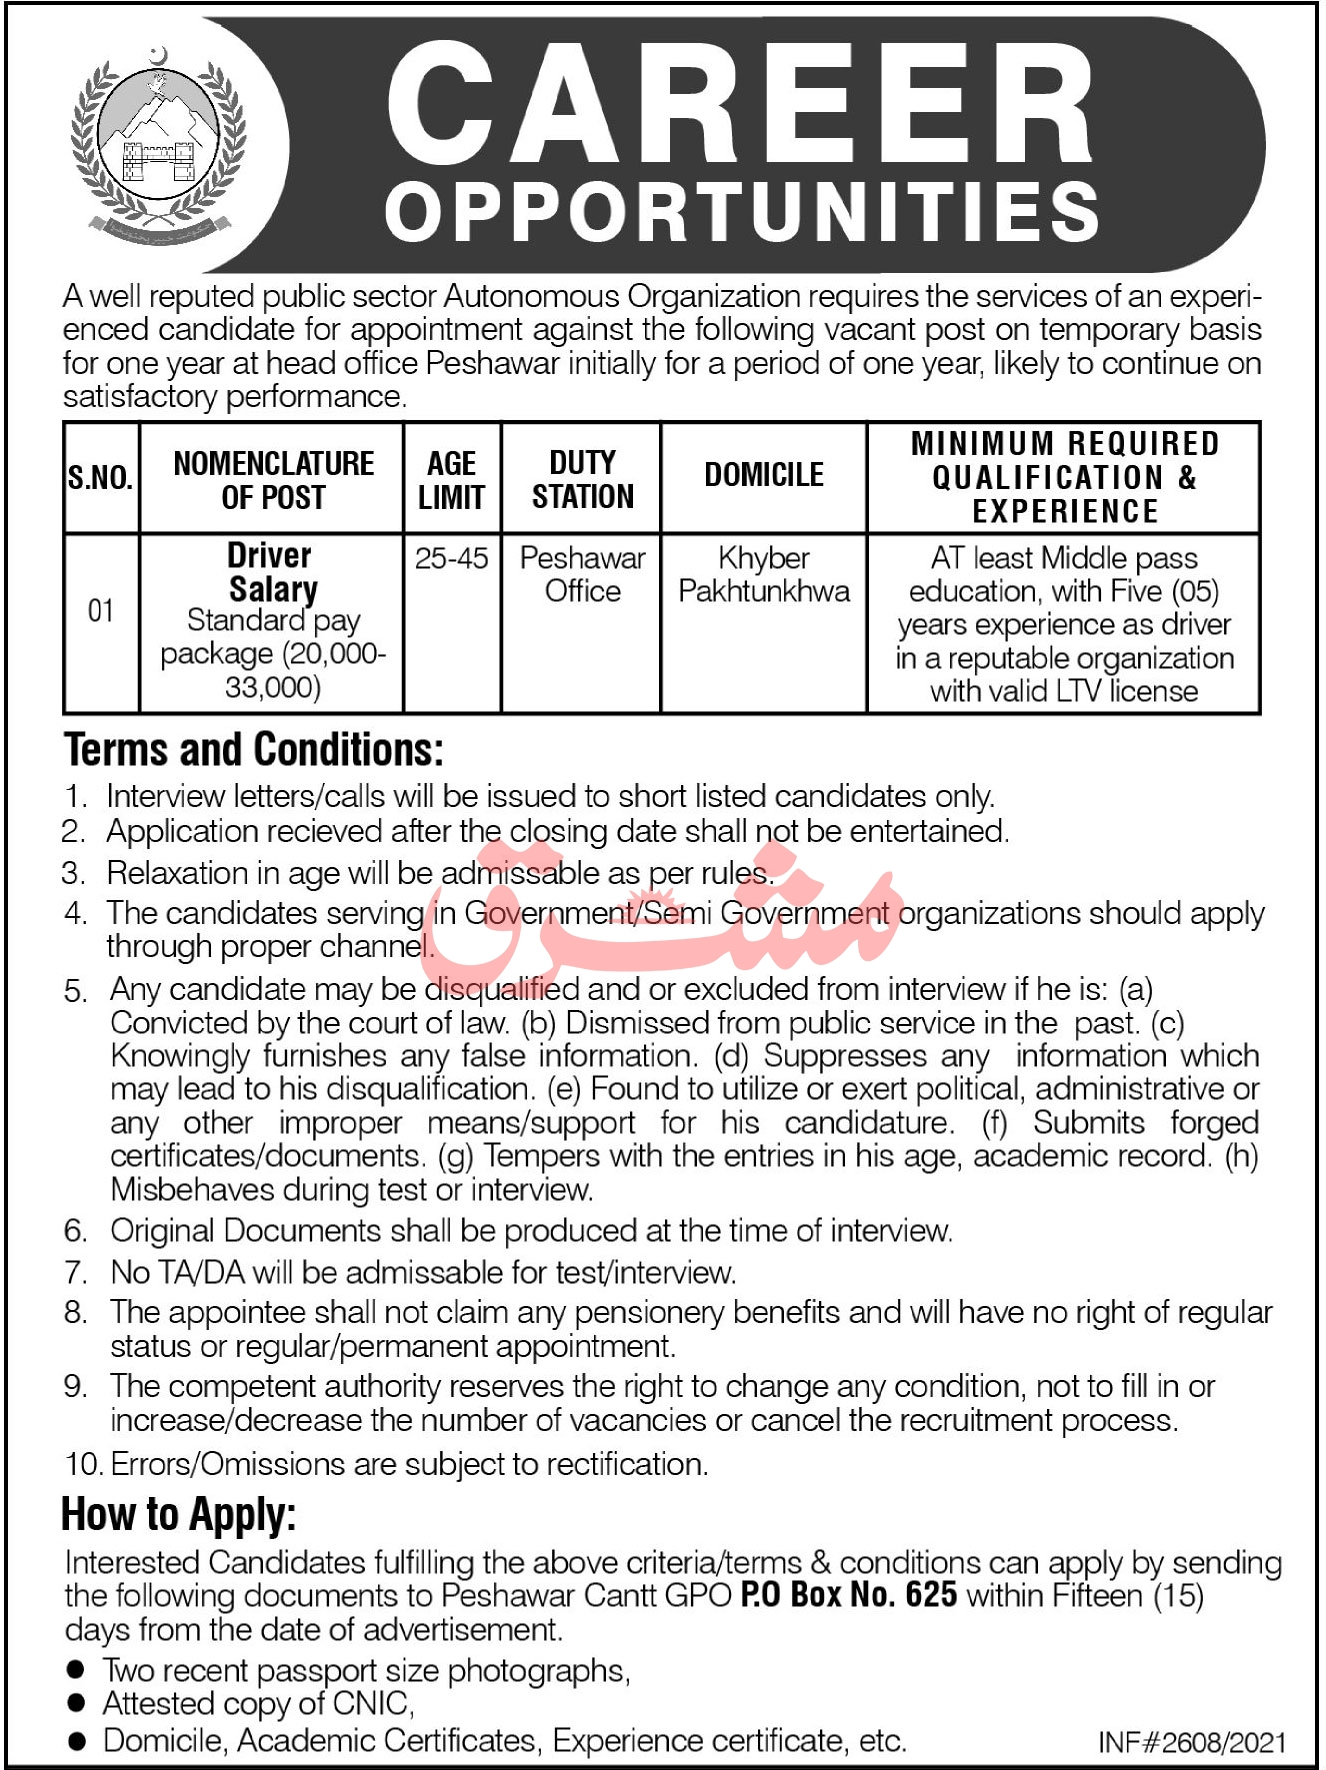 Public Sector Organization PO Box 625 Jobs 2021 in Pakistan